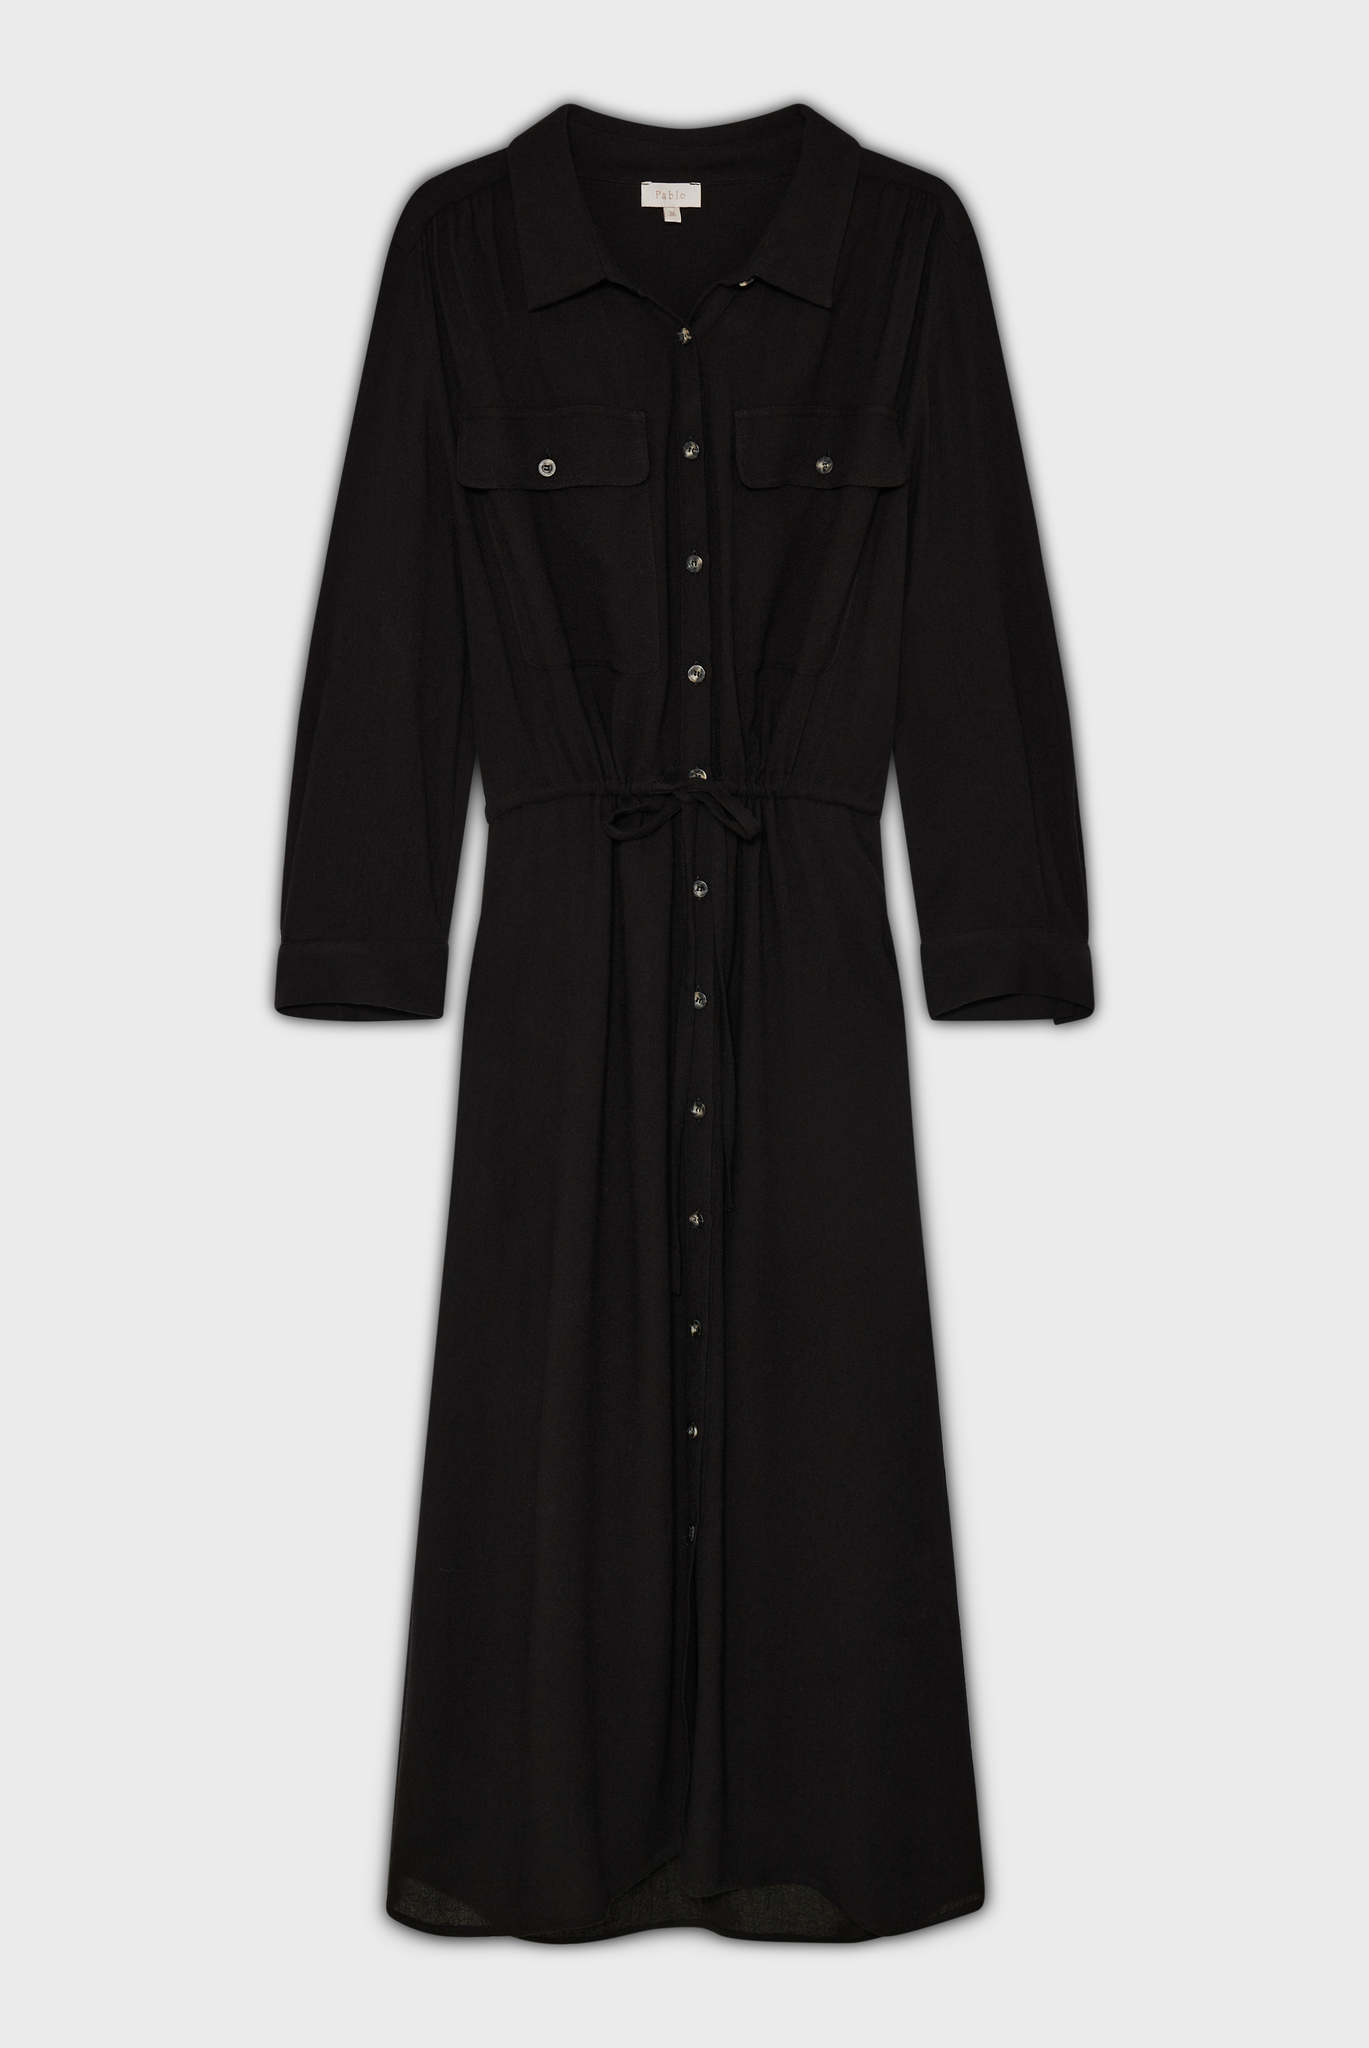 ROMA - Платье-рубашка с завязками на талии